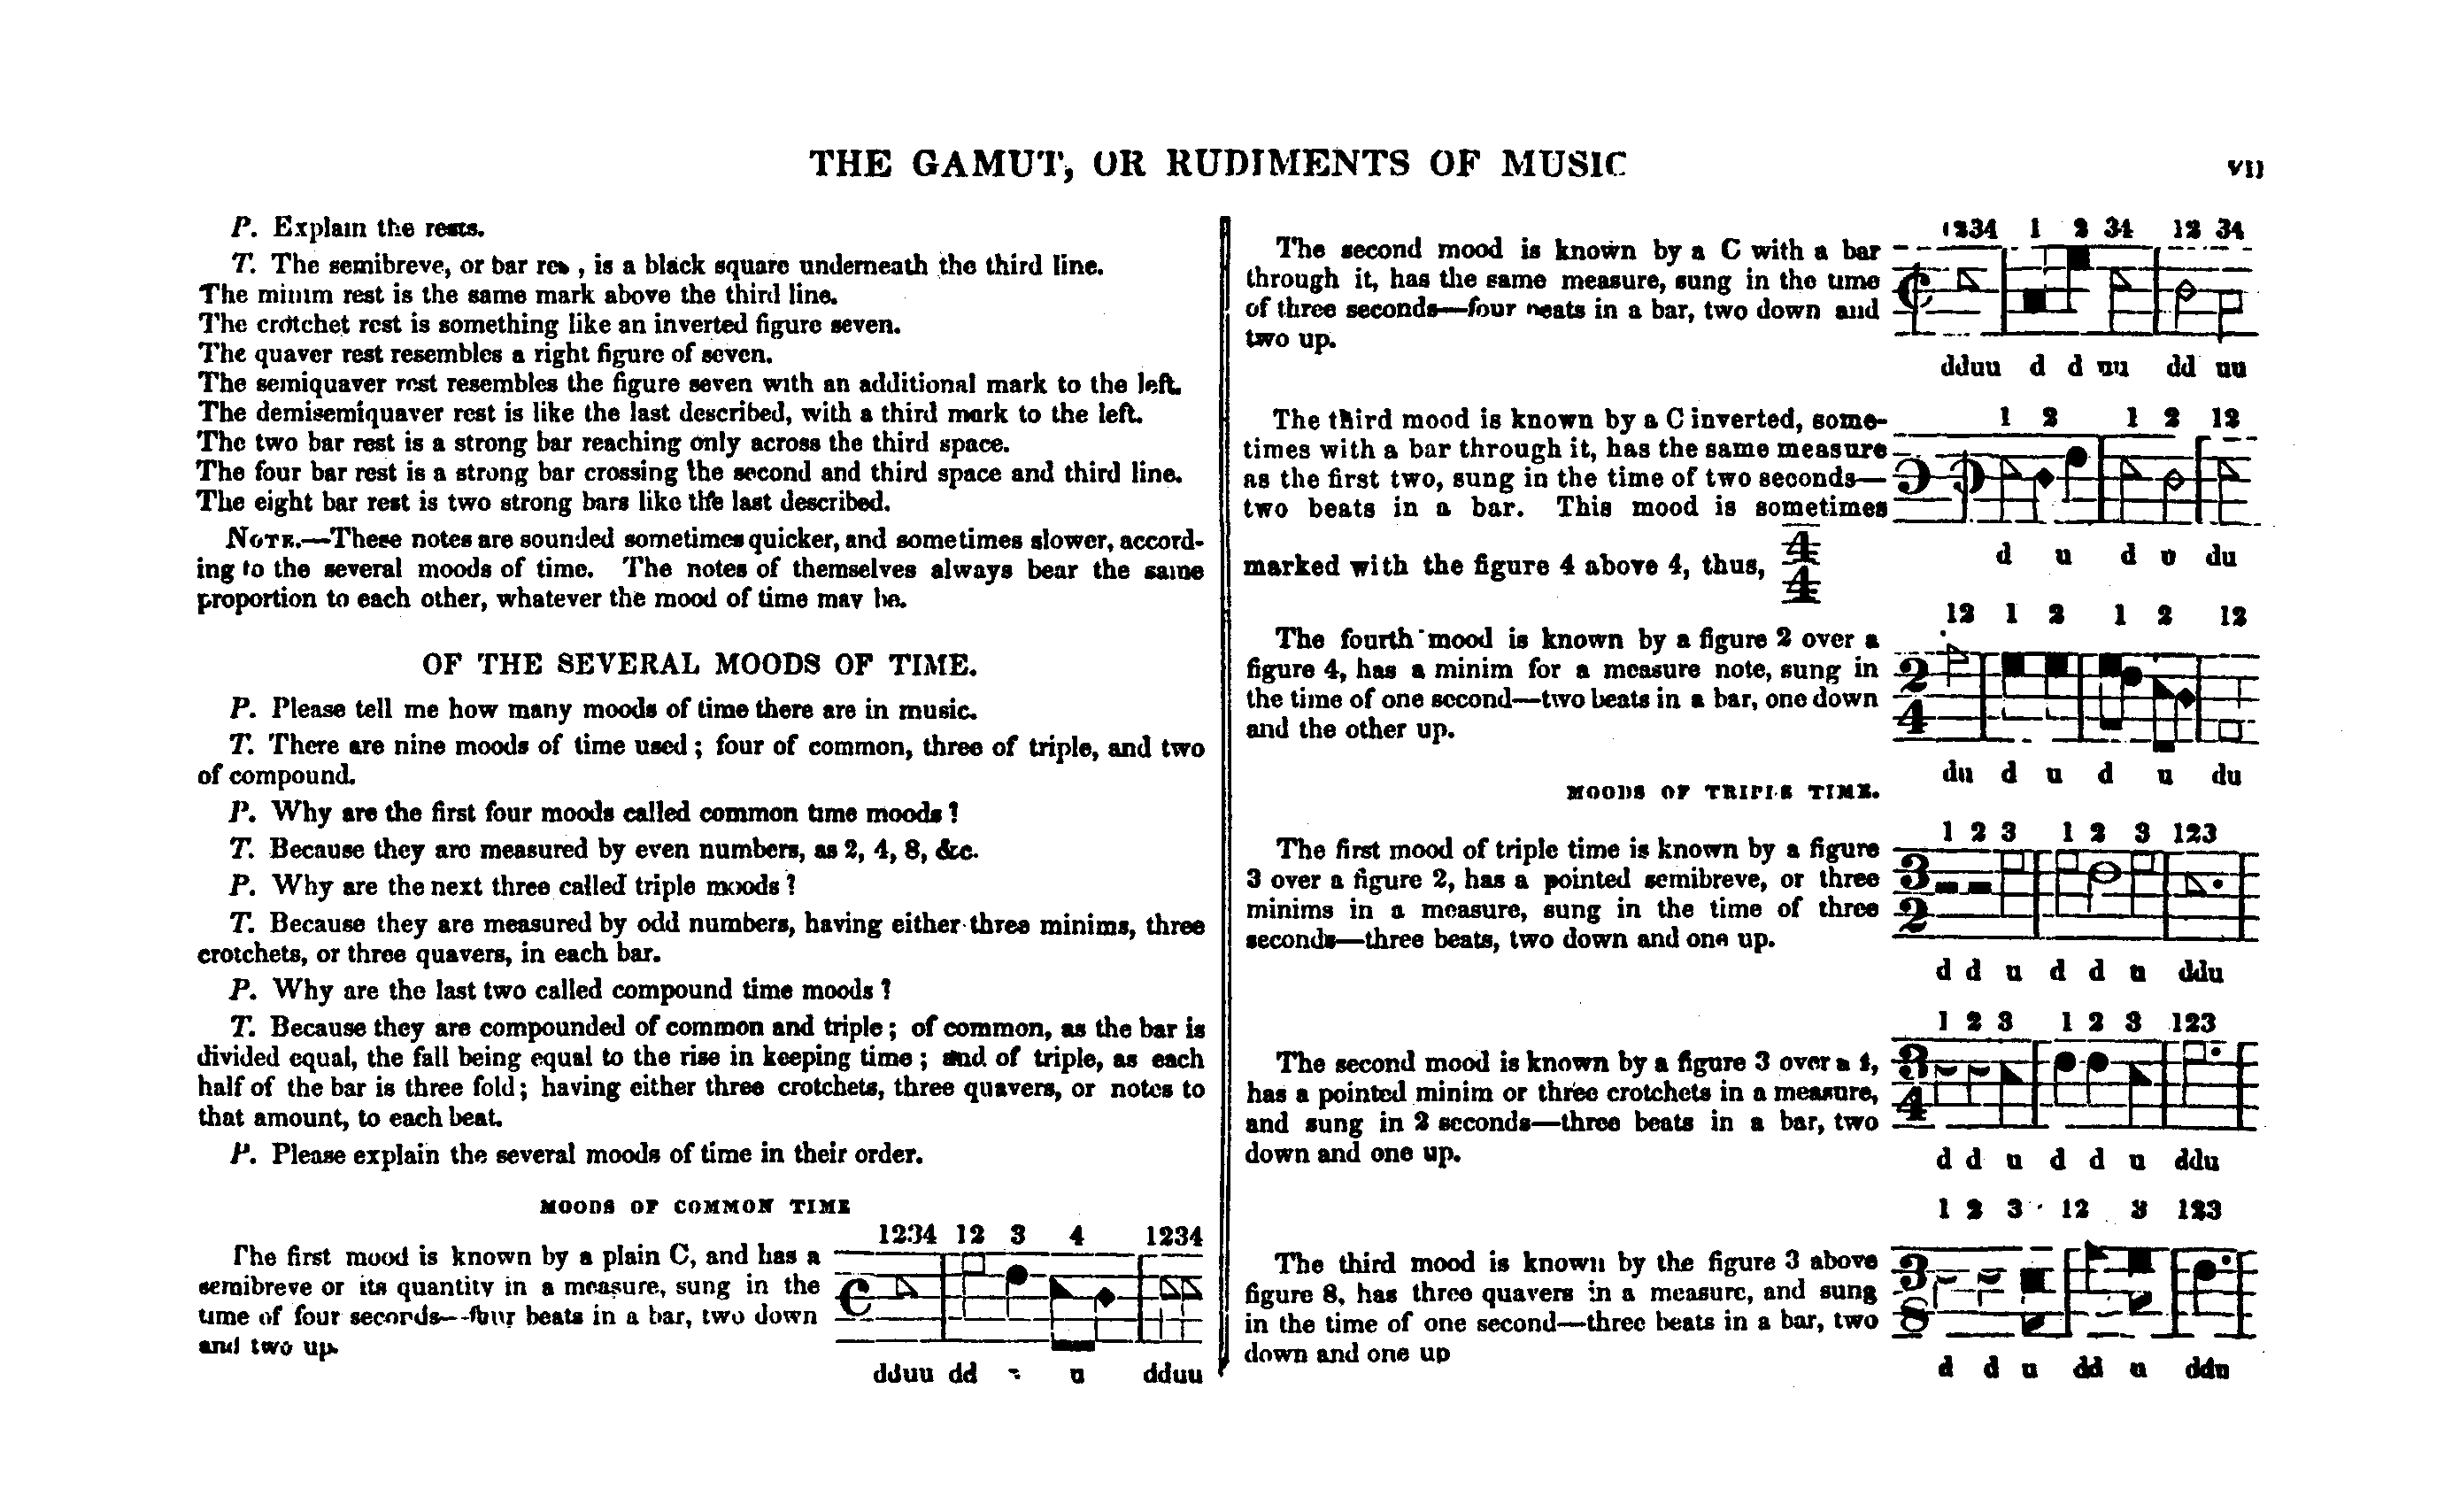 Scanned image of 0015=vii